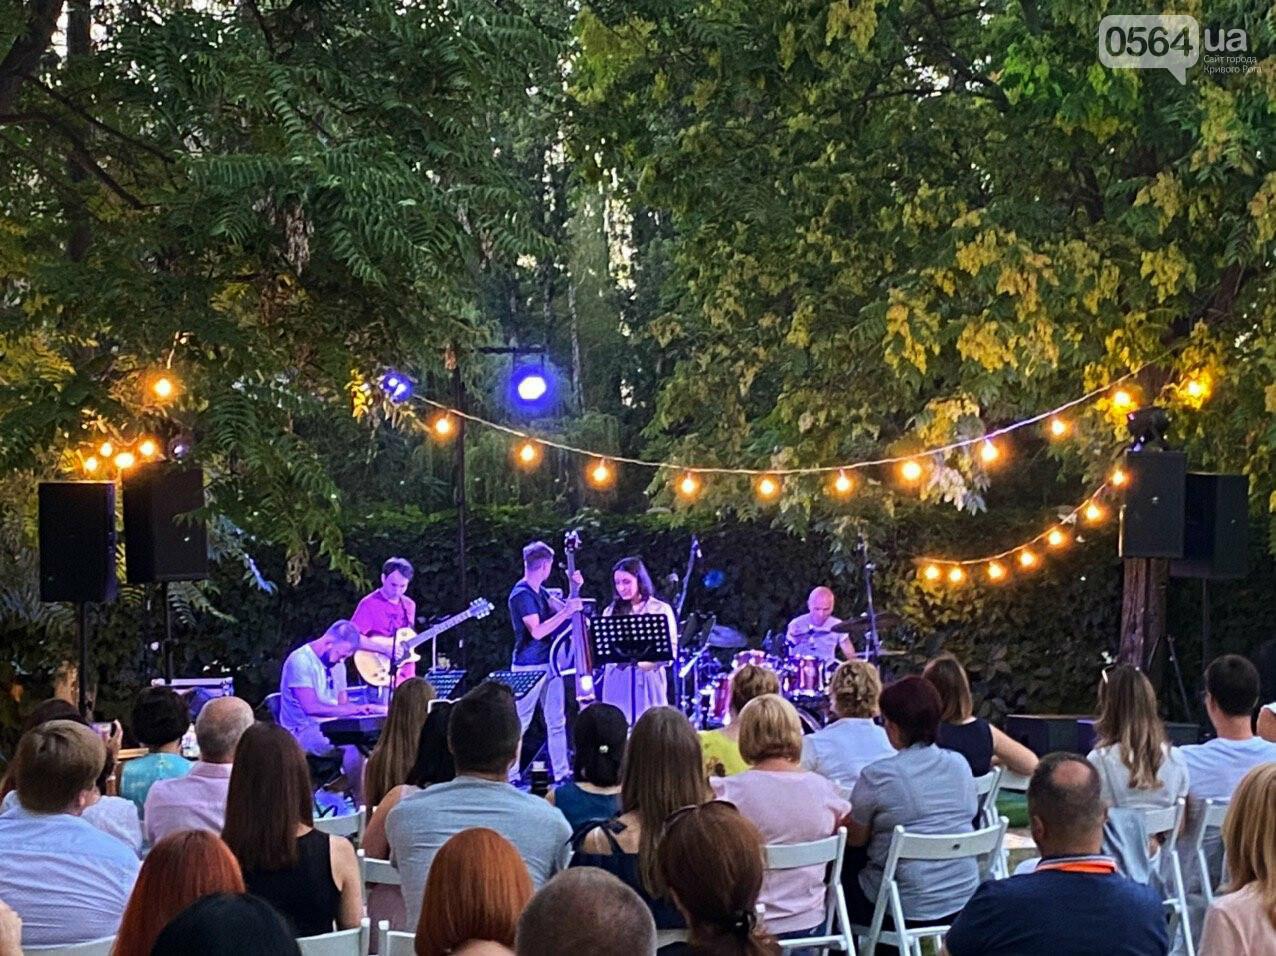 Под звездным небом криворожане наслаждались летним джазом от  Advantage Project, - ФОТО, ВИДЕО , фото-37